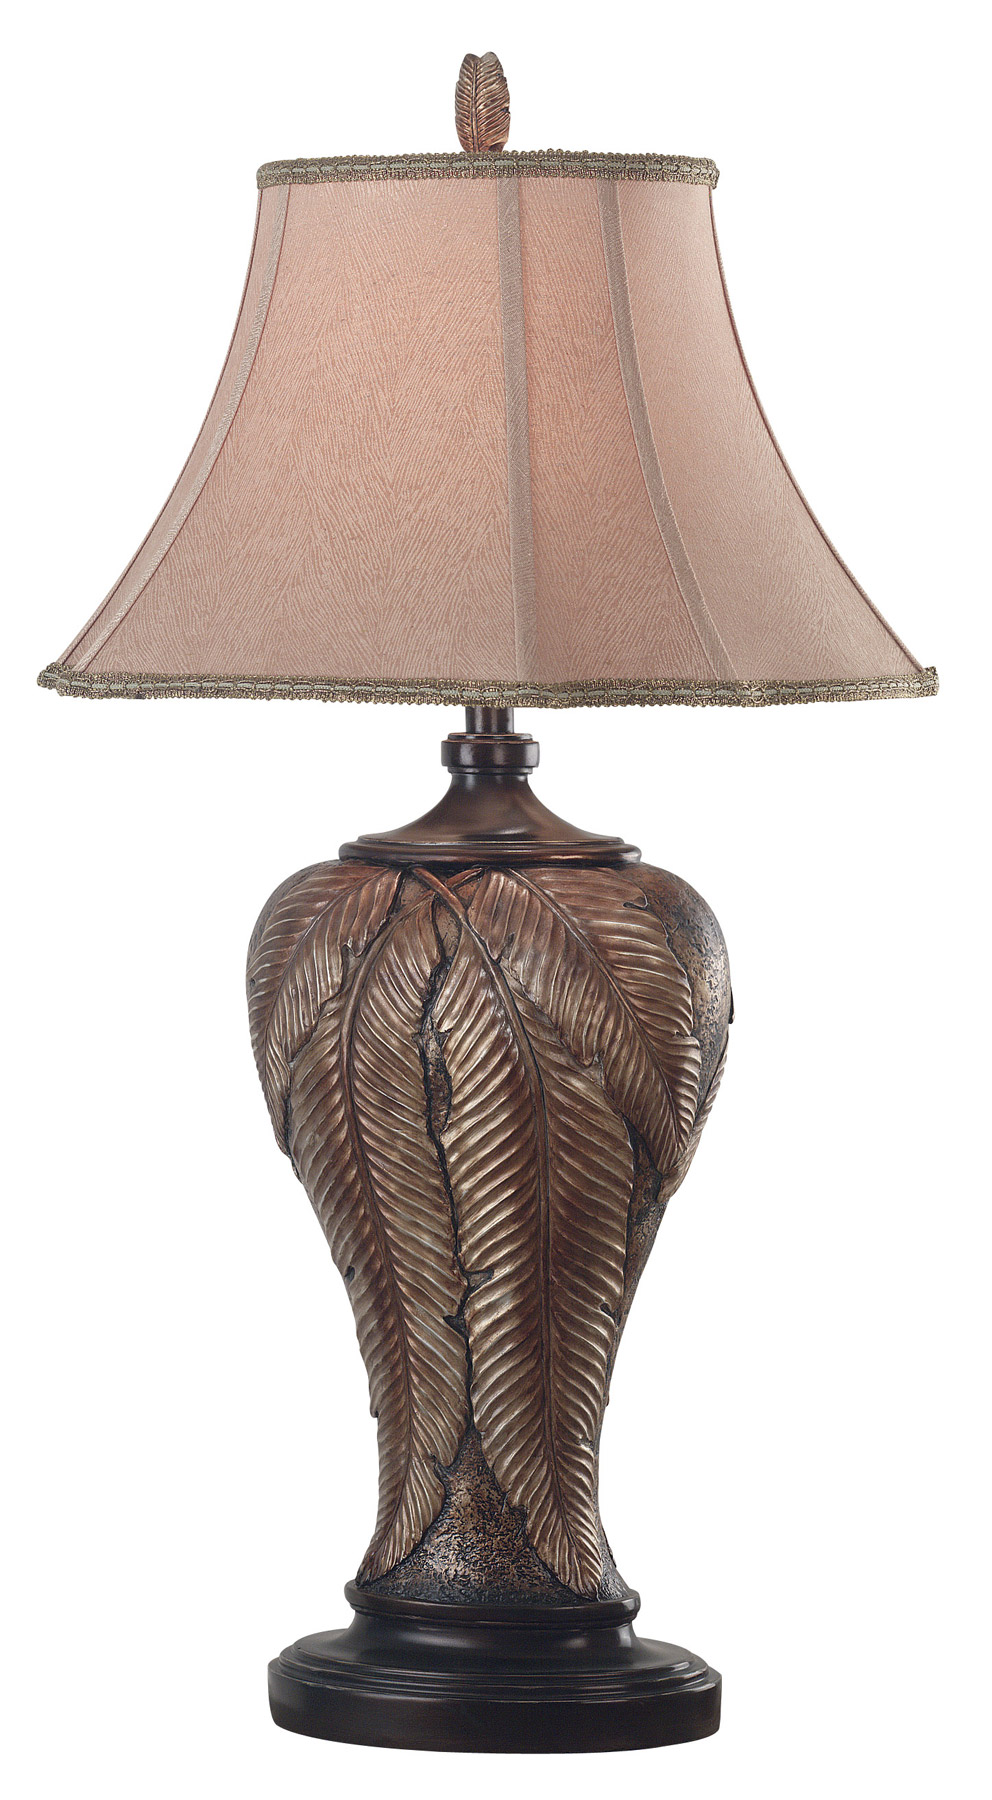 Kenroy home 31124lbz bermuda table lamp - Kenay home lamparas ...